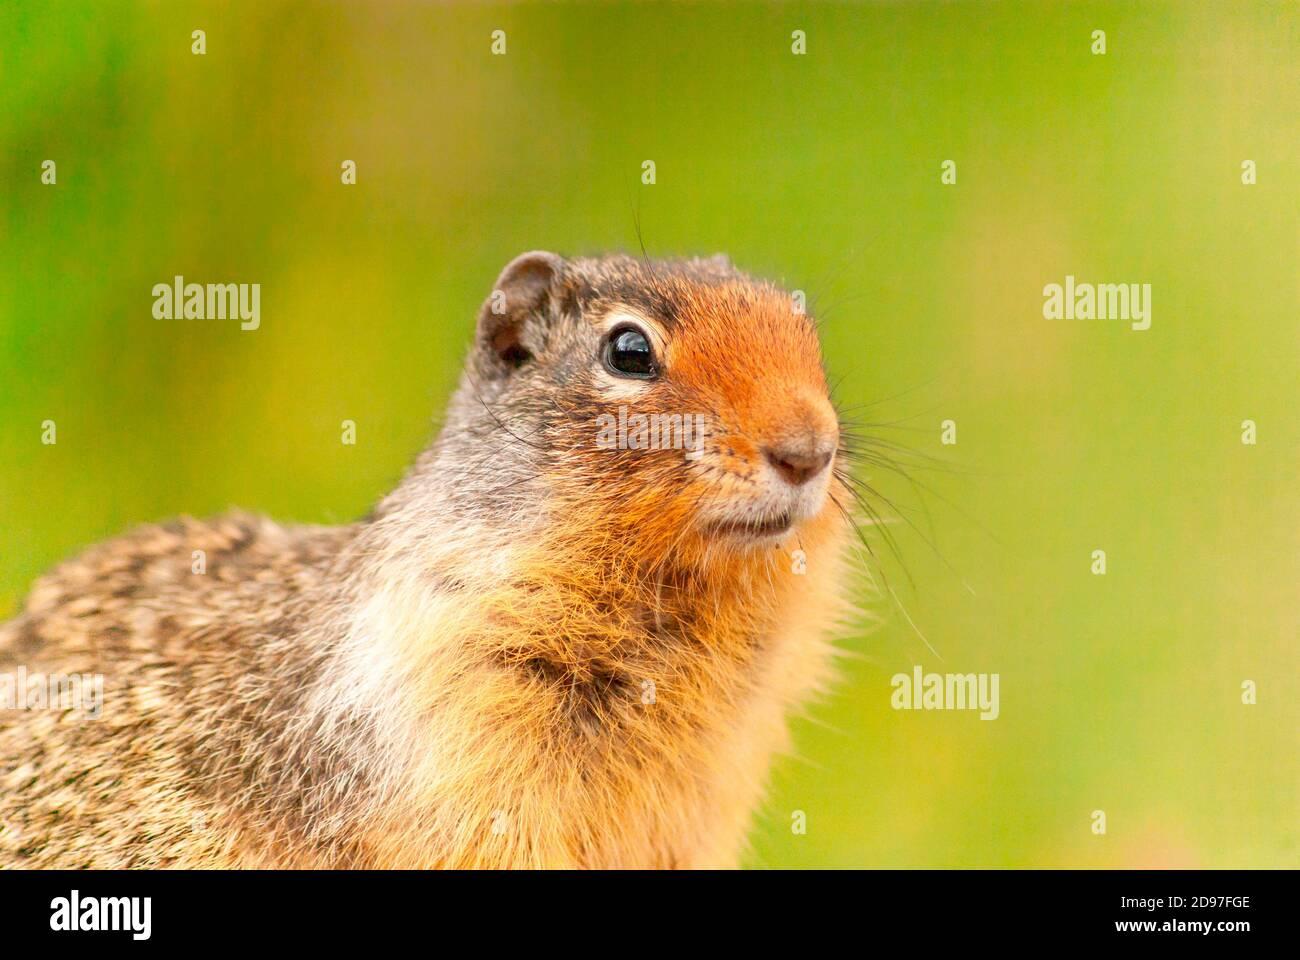 Columbian ground squirrel (Urocitellus columbianus) portrait, Rocky Mountains, Canada Stock Photo